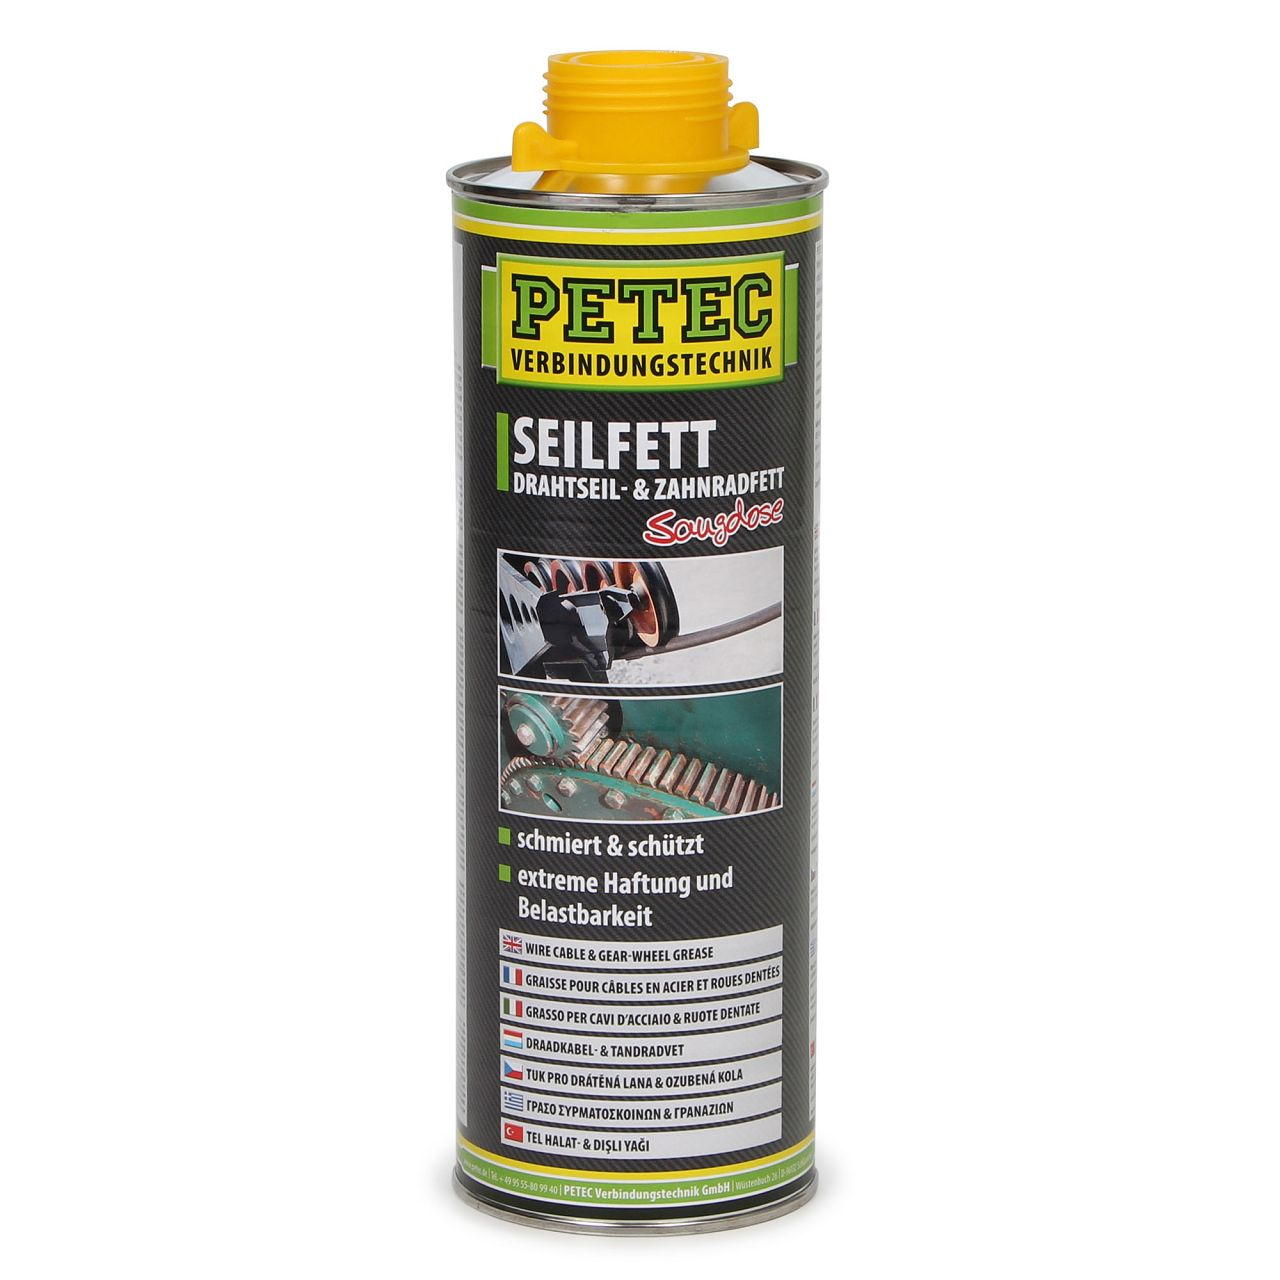 PETEC 73610 Seilfett Drahtseilfett Zahnradfett Saugdose Korrosionsschutz 1000ml